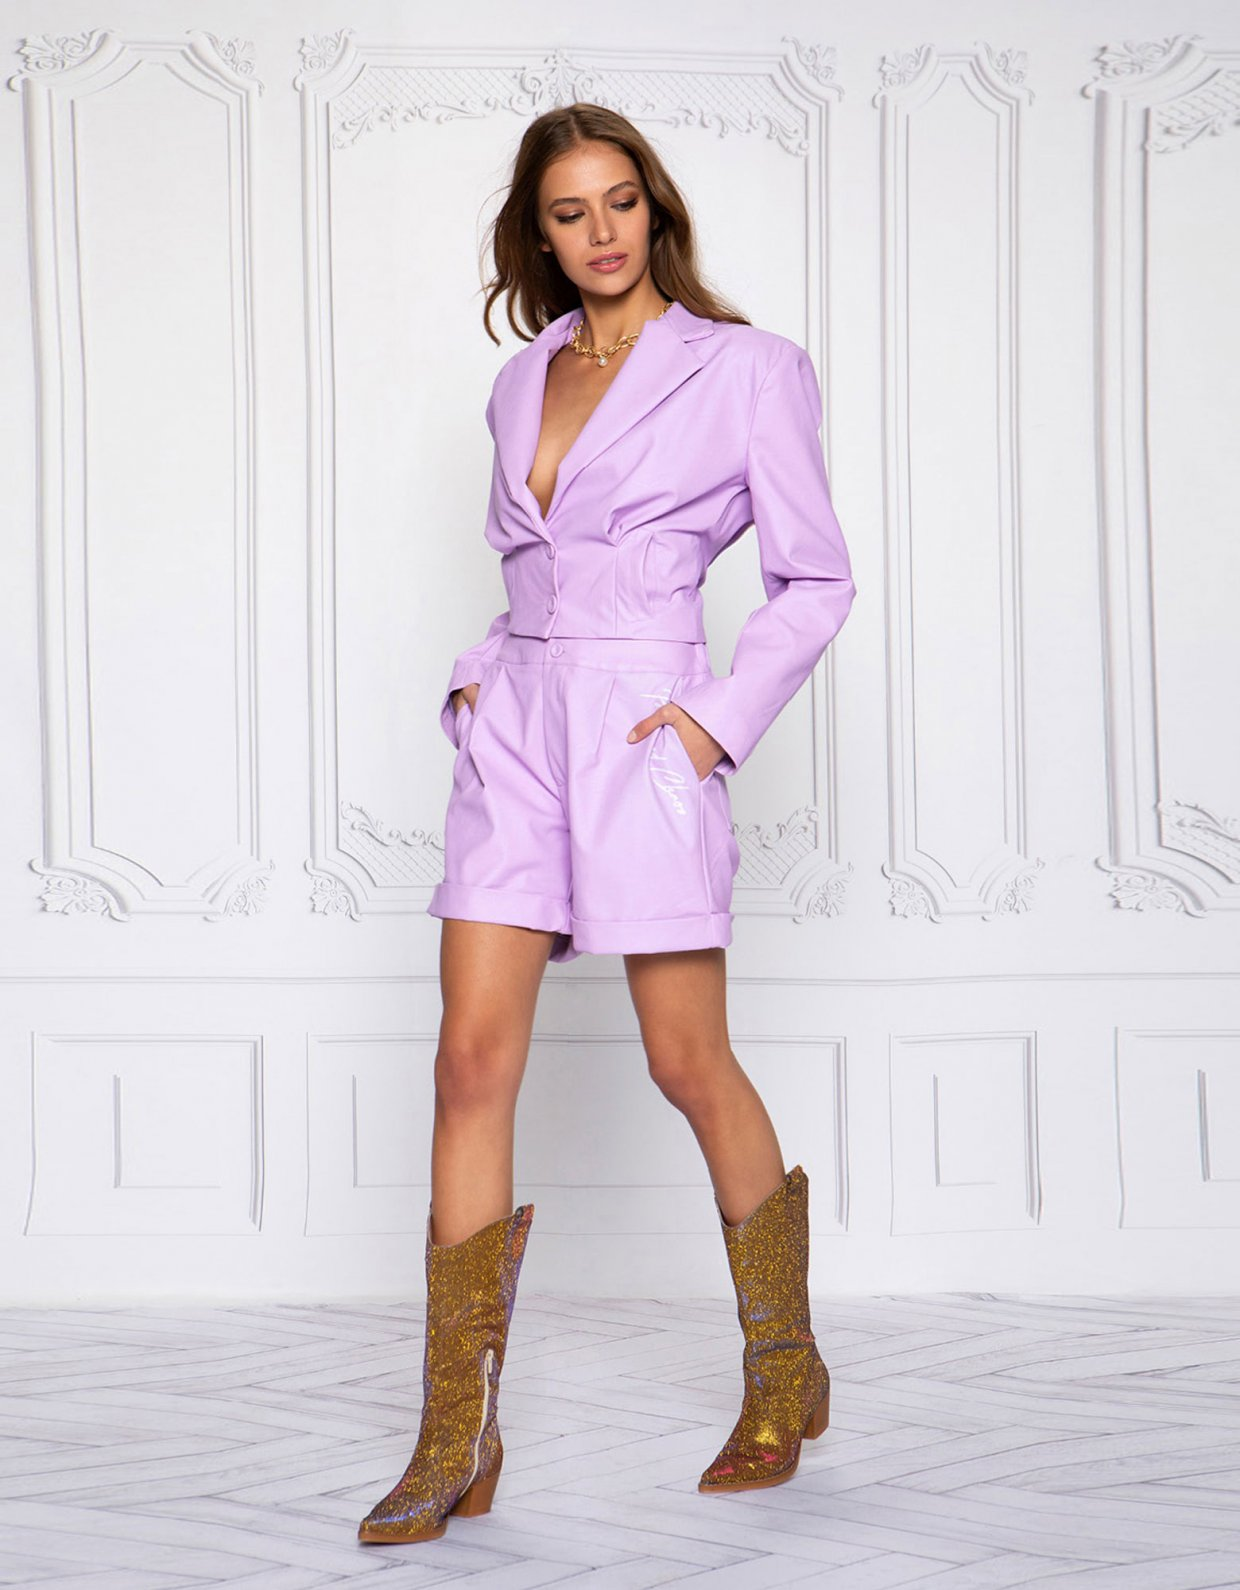 Peace & Chaos On fleek lilac eco leather shorts